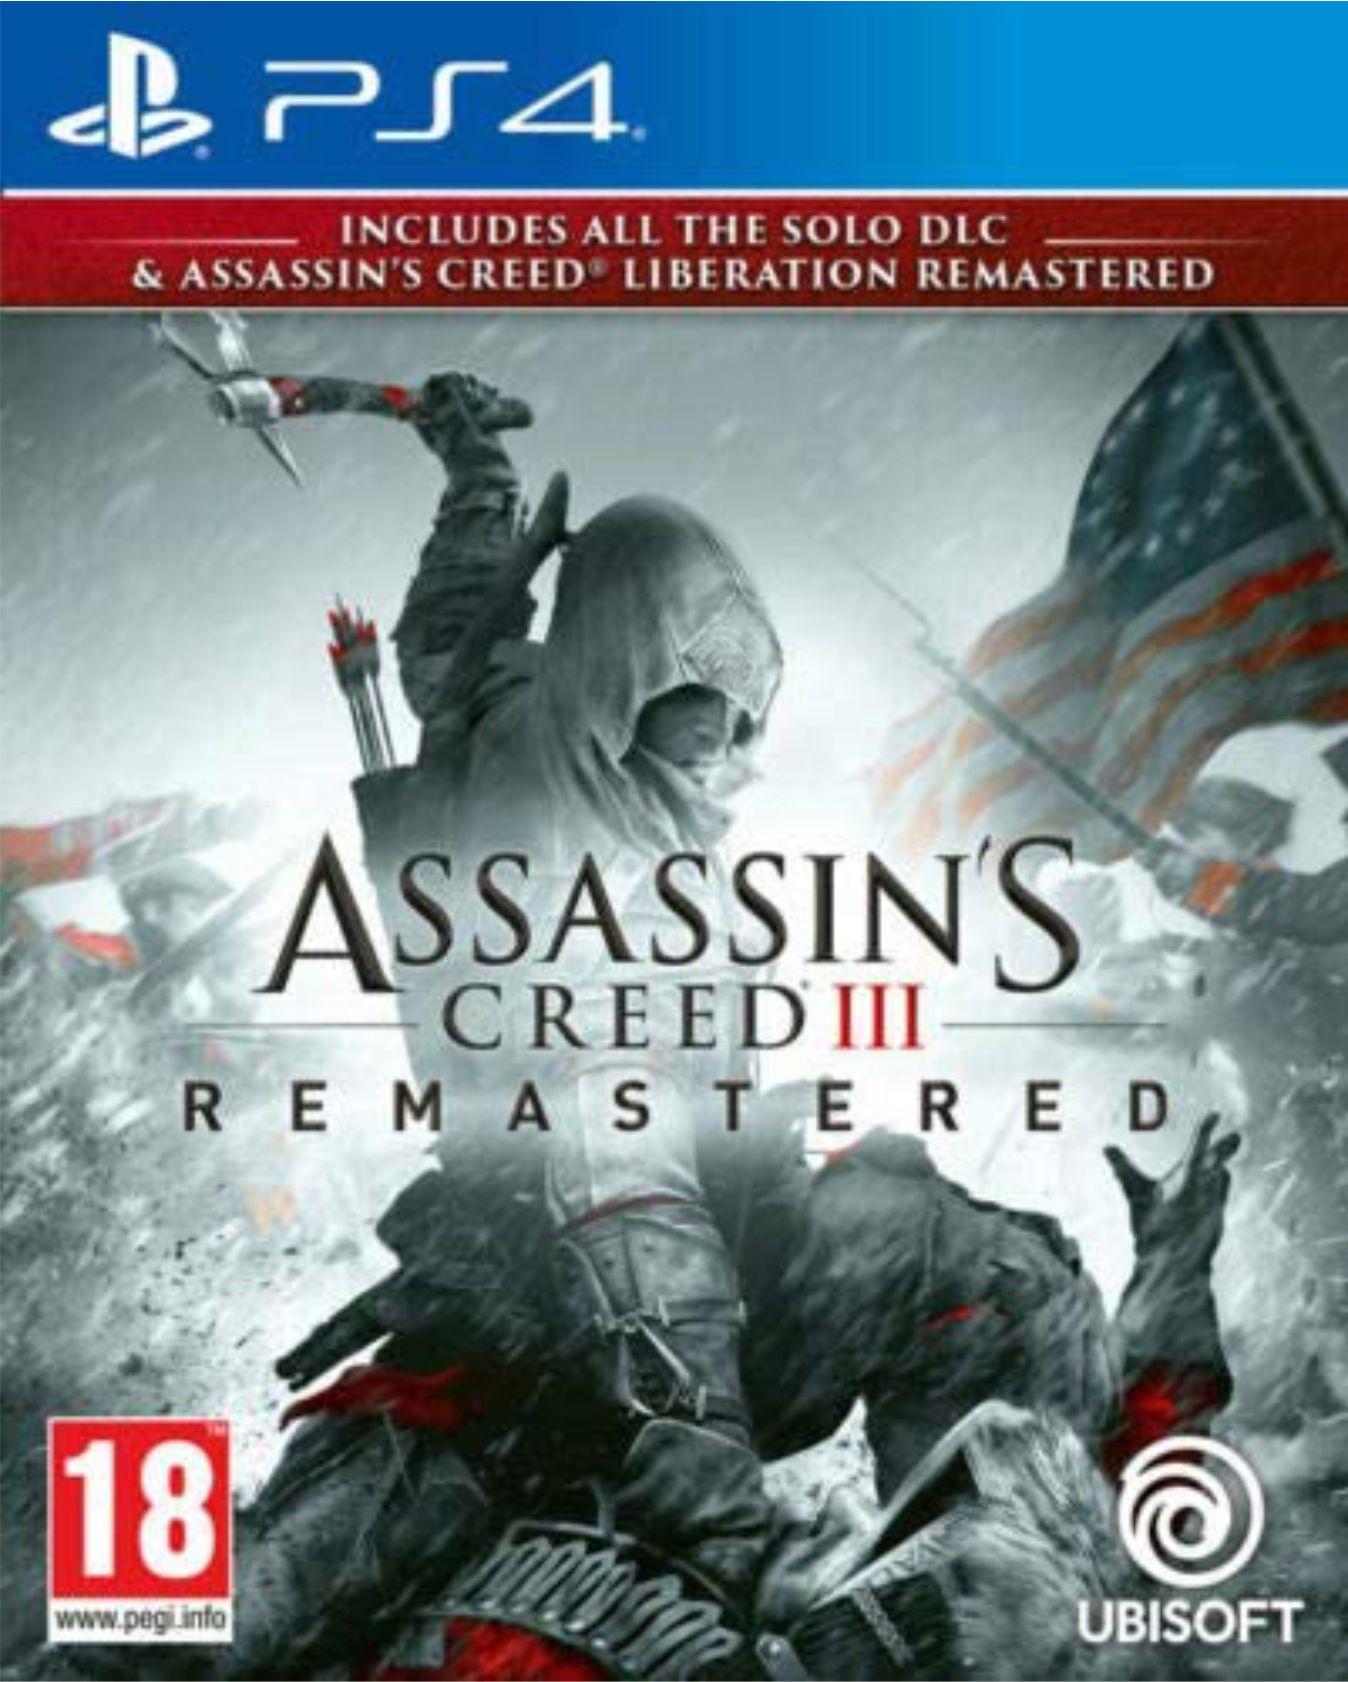 PS4 Assassin's Creed 3 + Assassin's Creed: Liberation (nová)